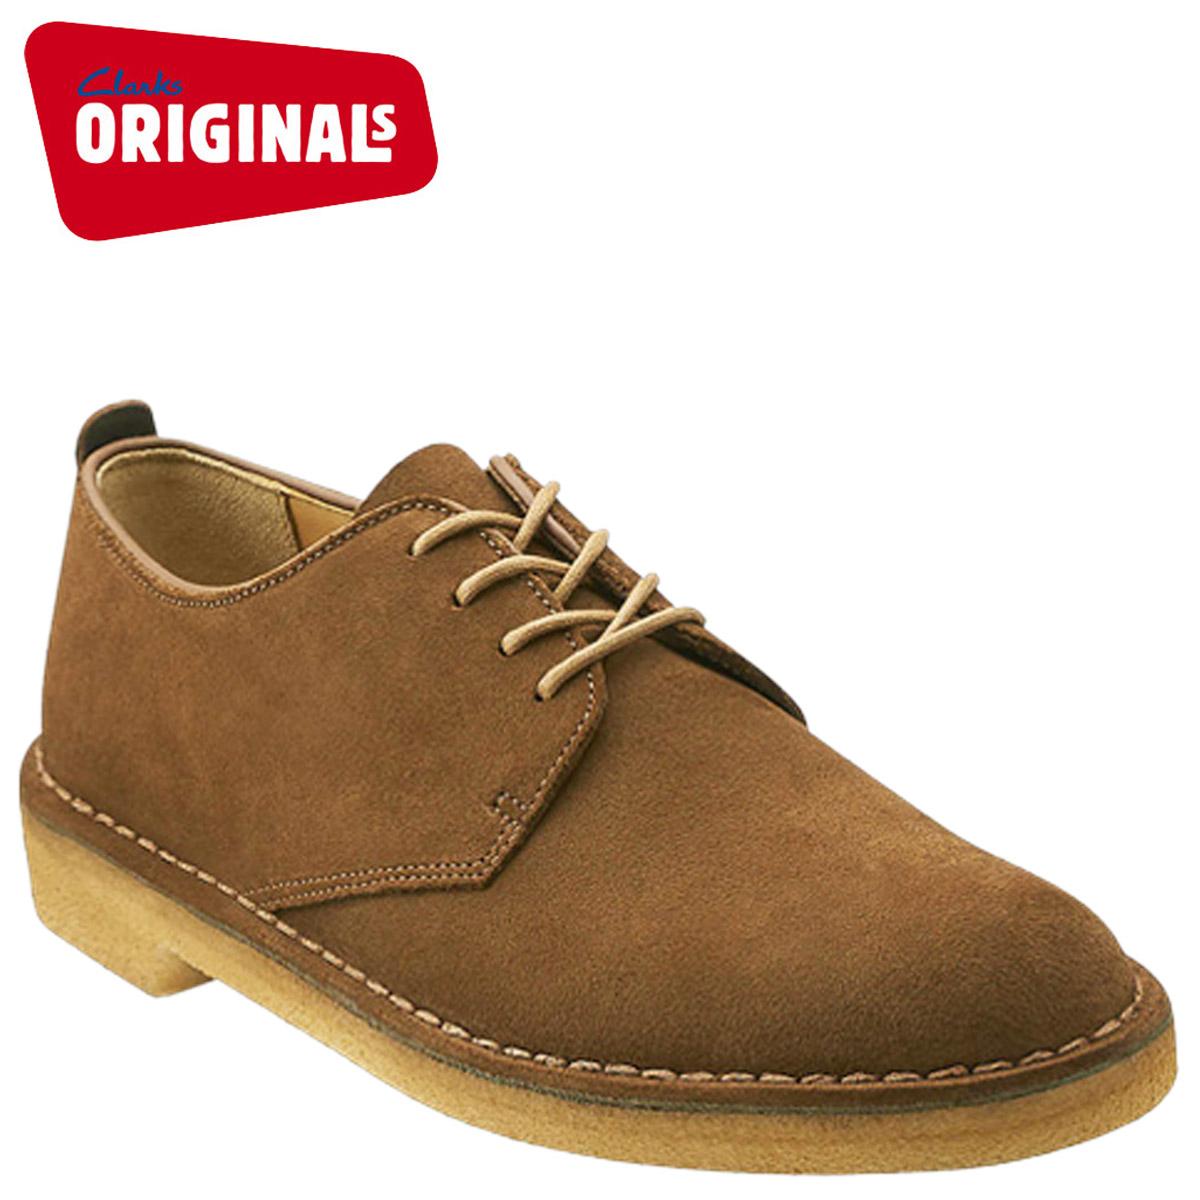 Clarks ORIGINALS kulaki originals dessert London shoes DESERT LONDON 66009 men